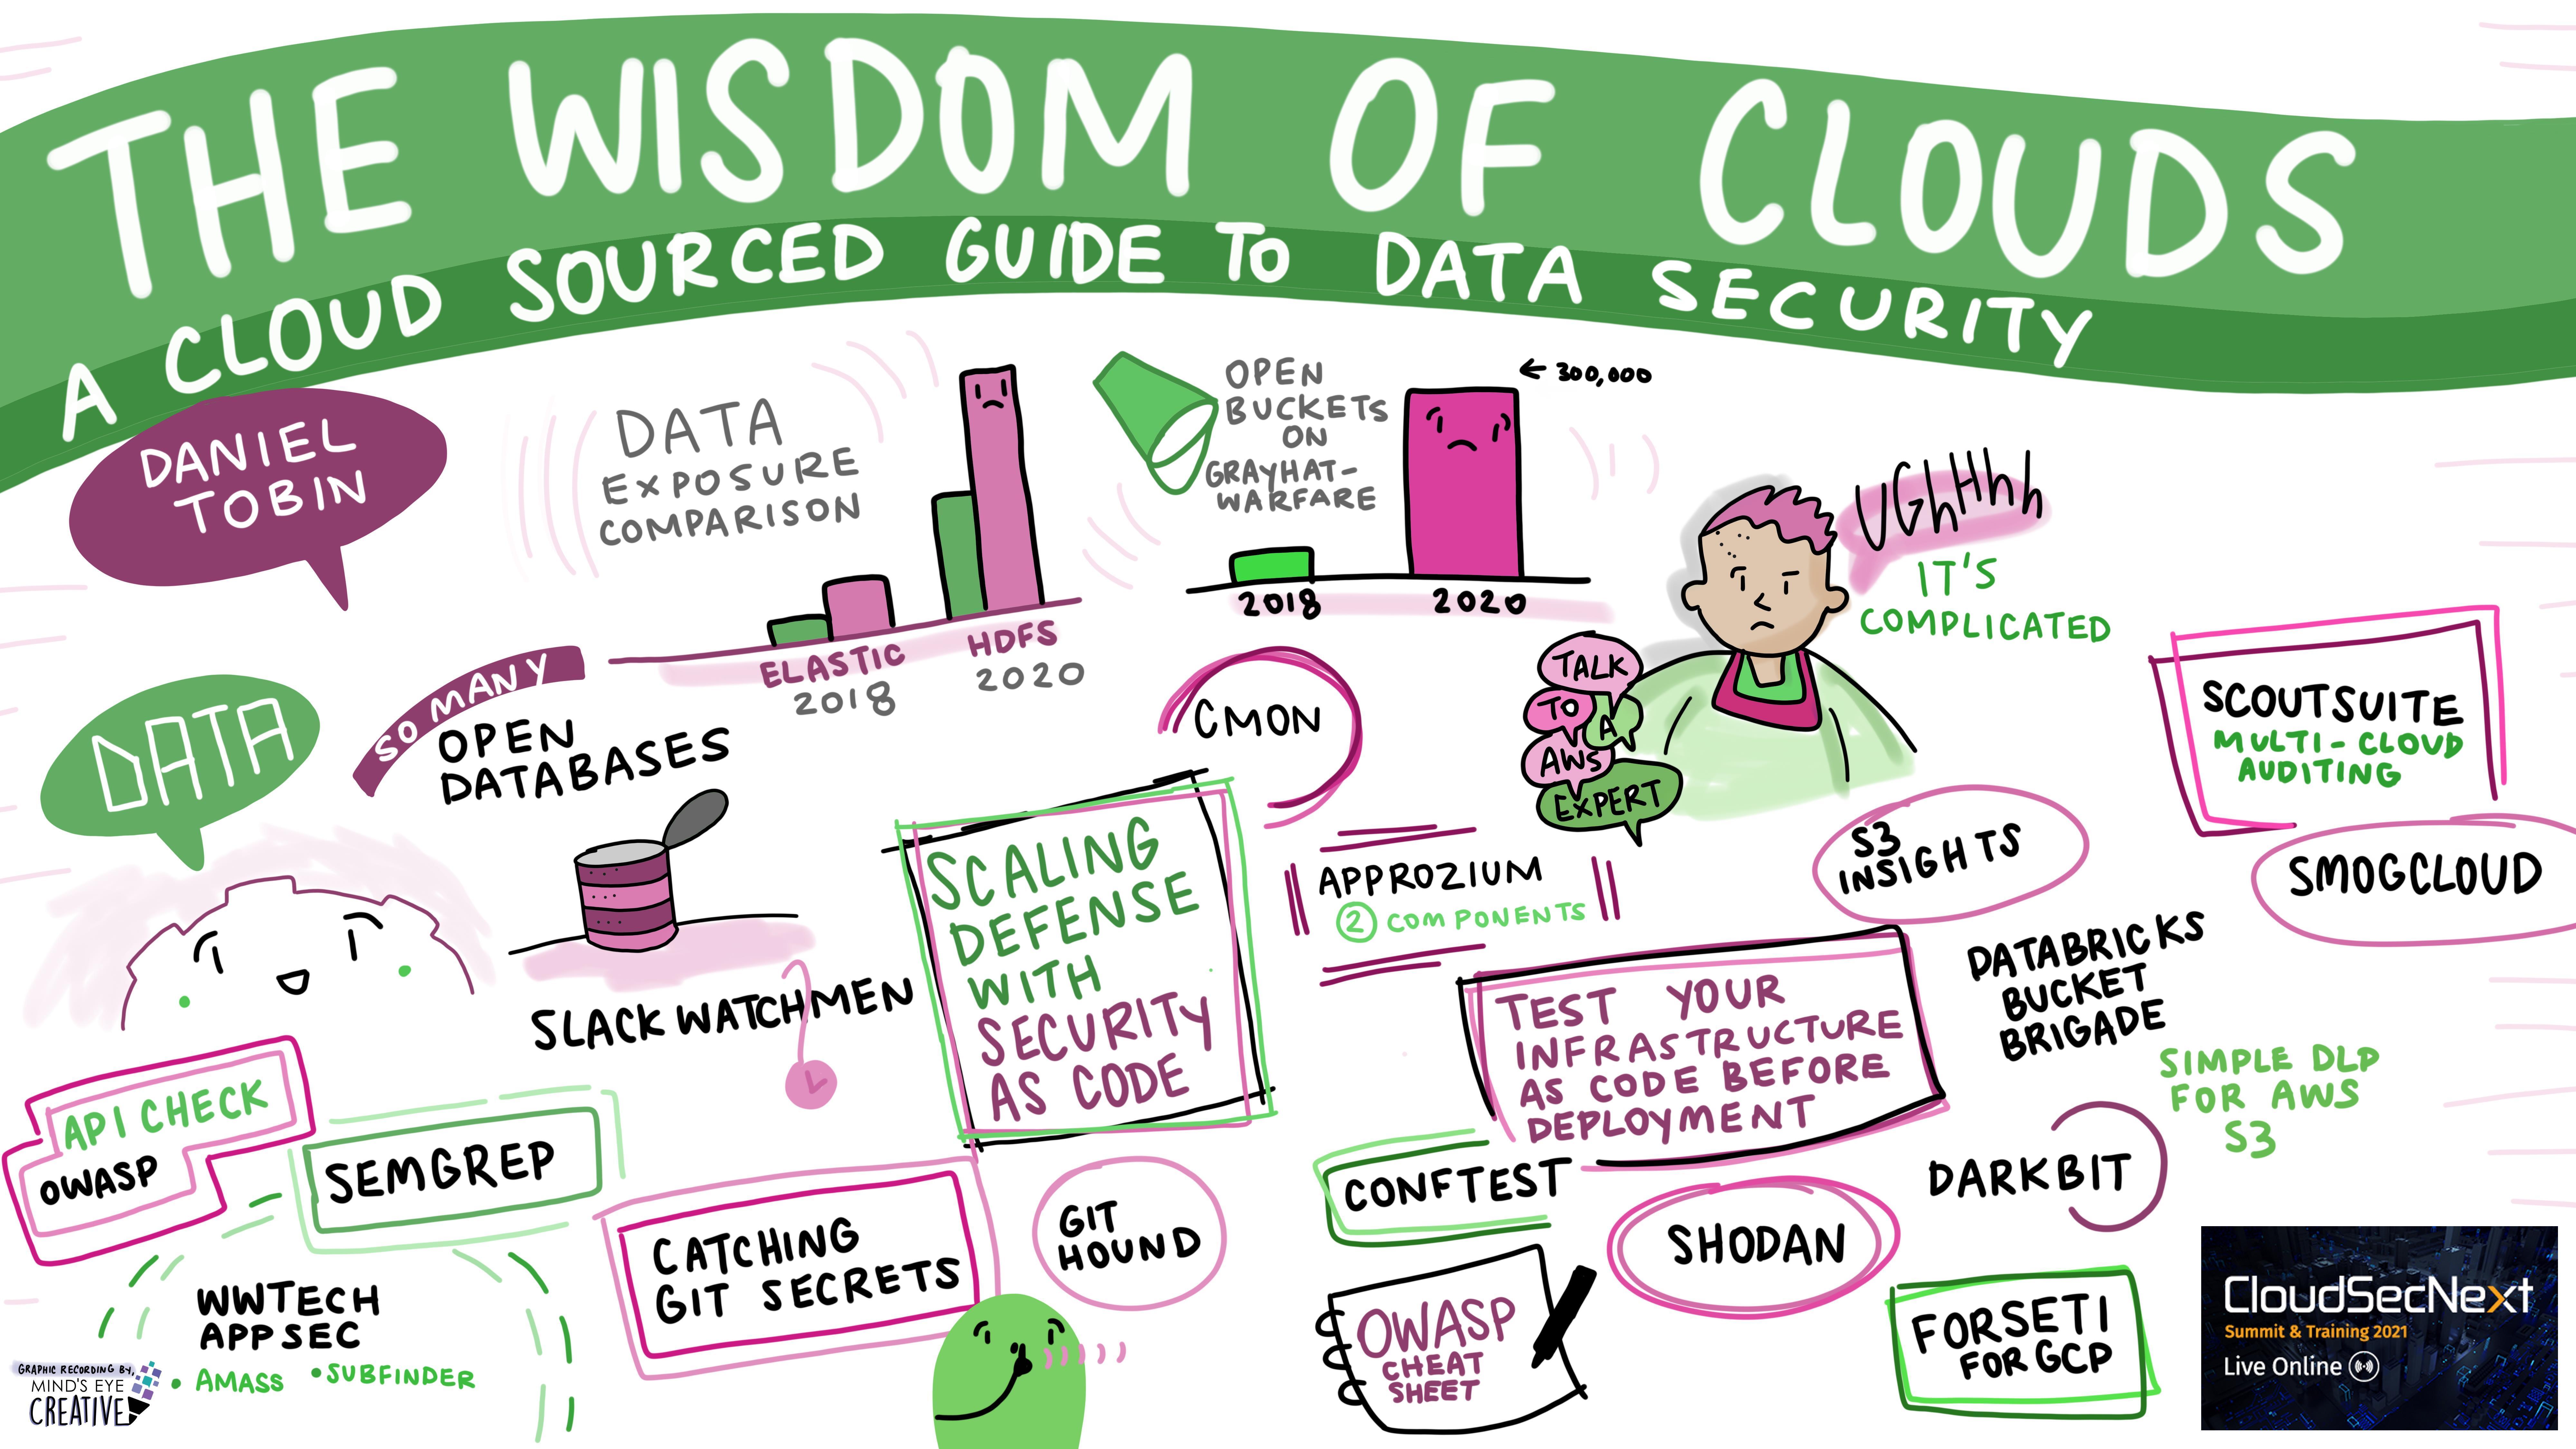 06_CloudSecNext_Daniel_Tobin.jpg